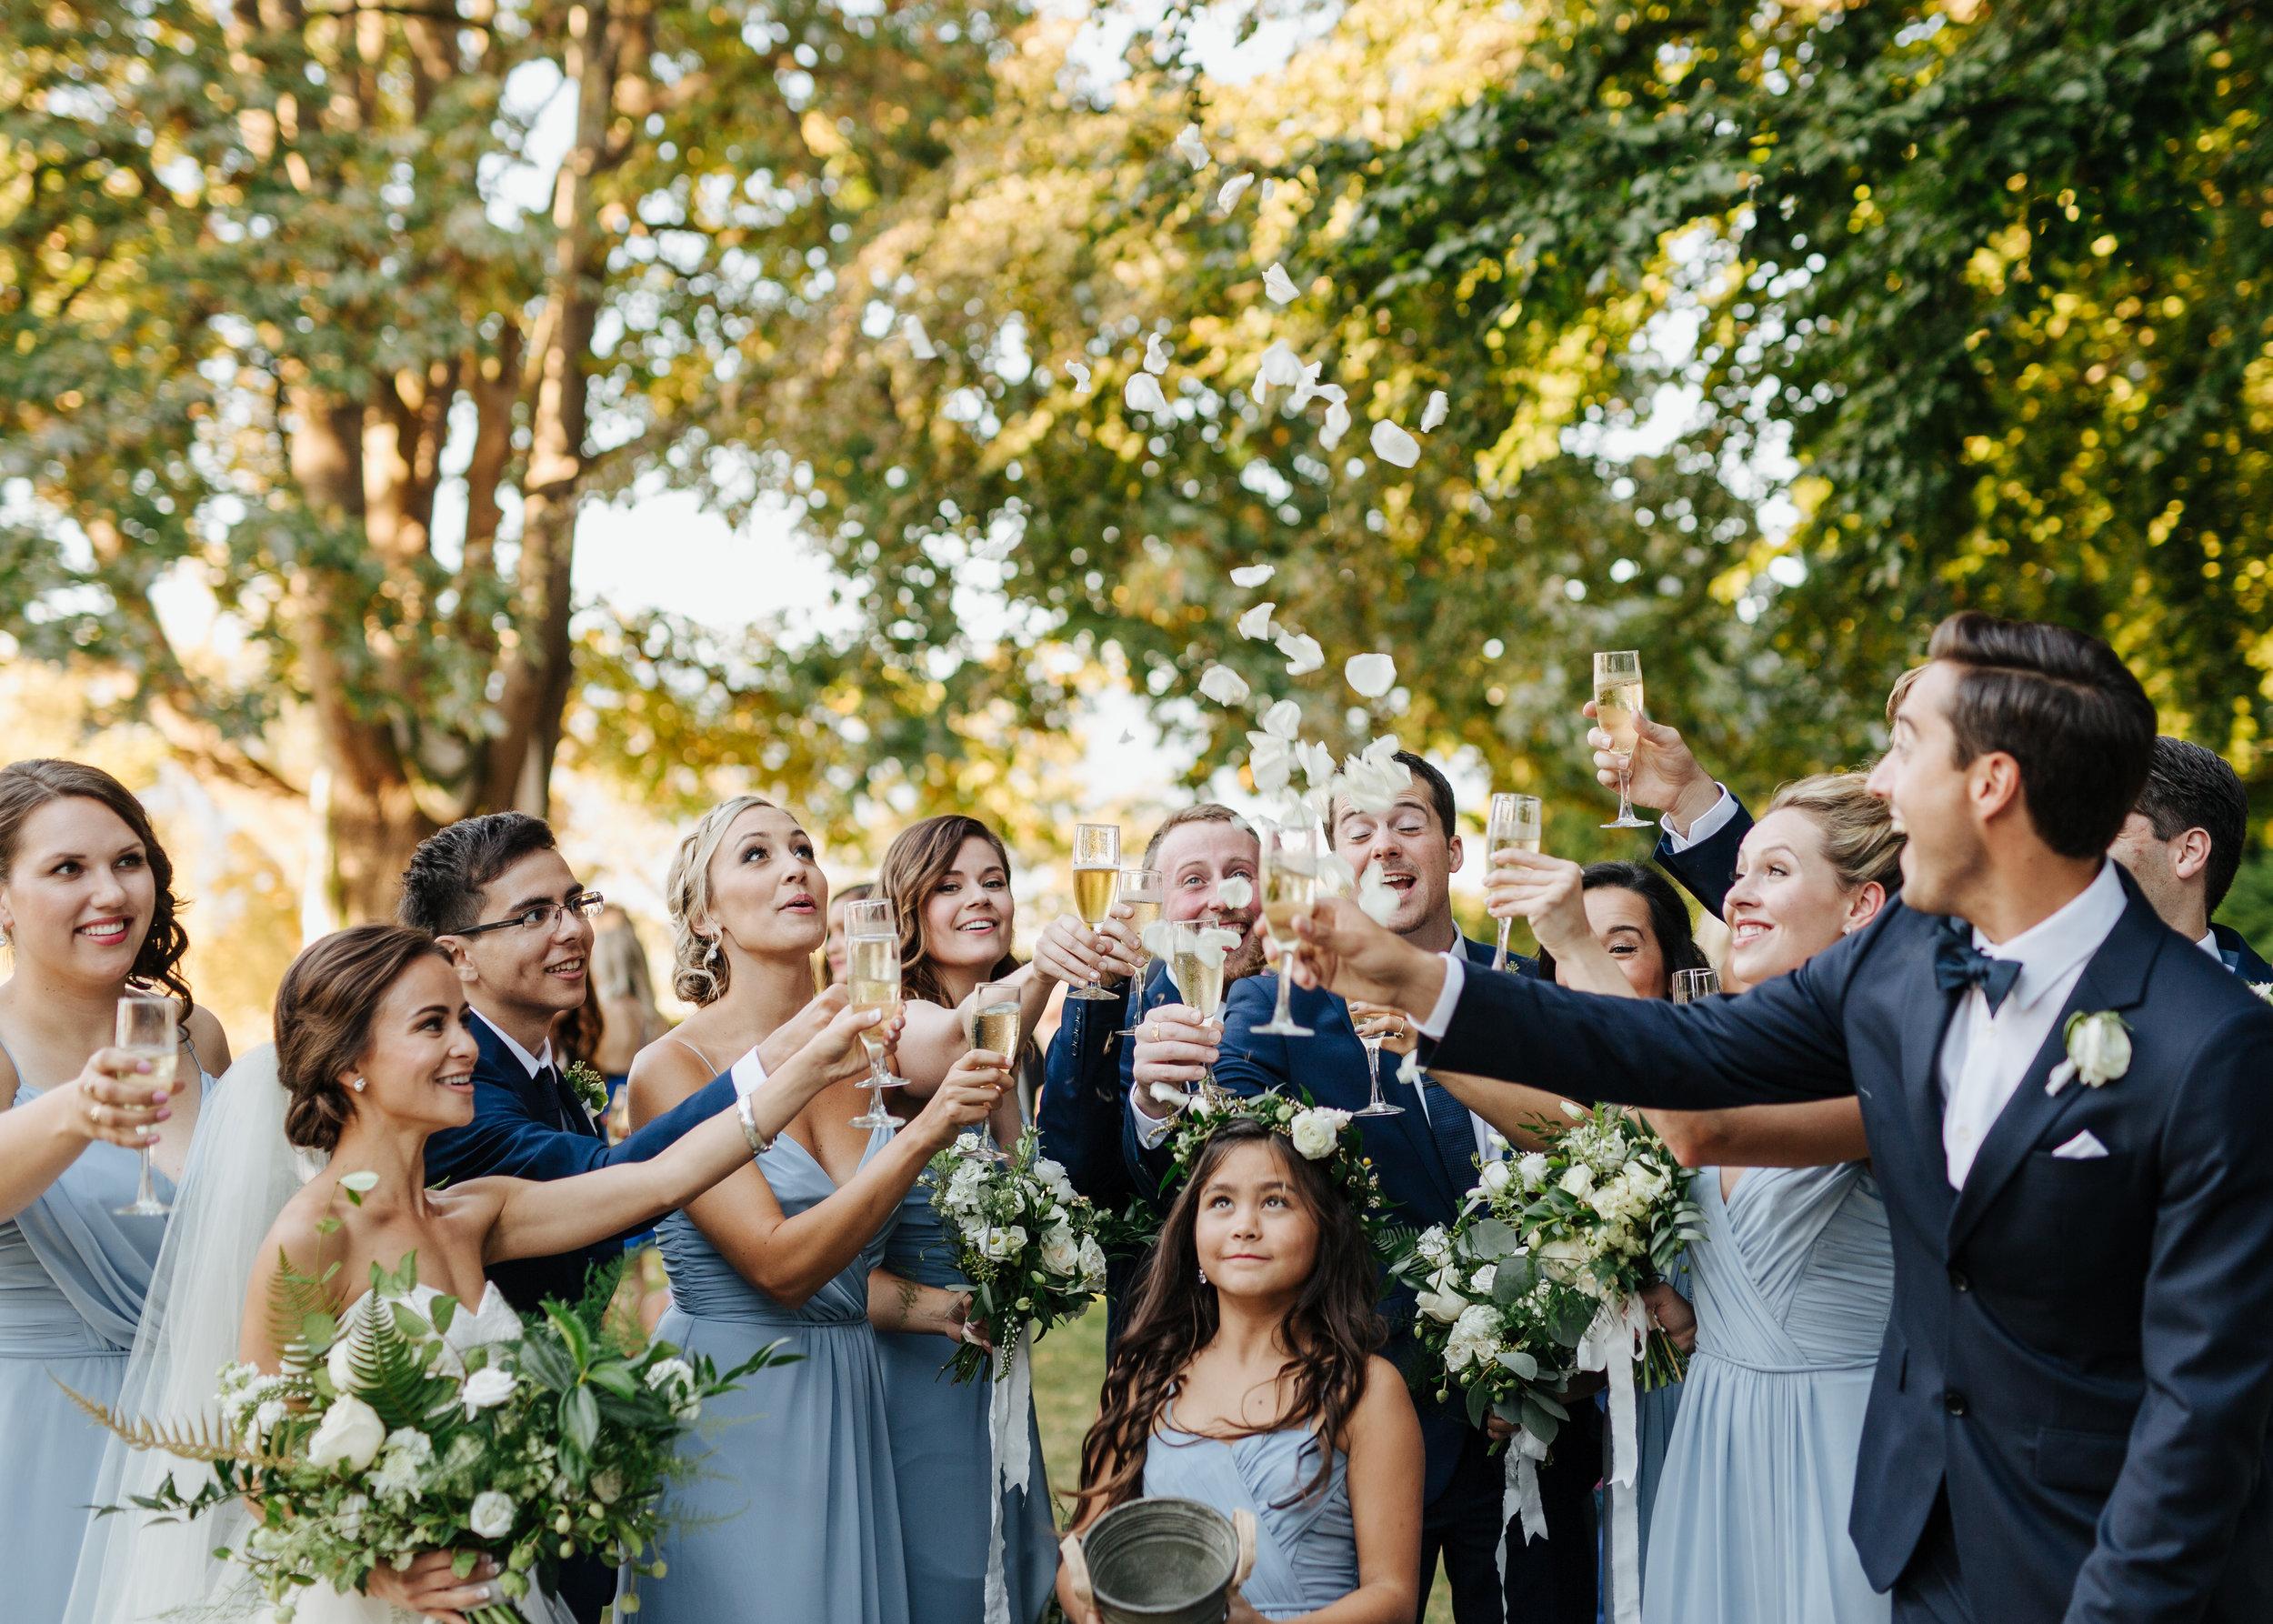 herafilms_carlotta_alex_wedding_hera_highres-53.jpg